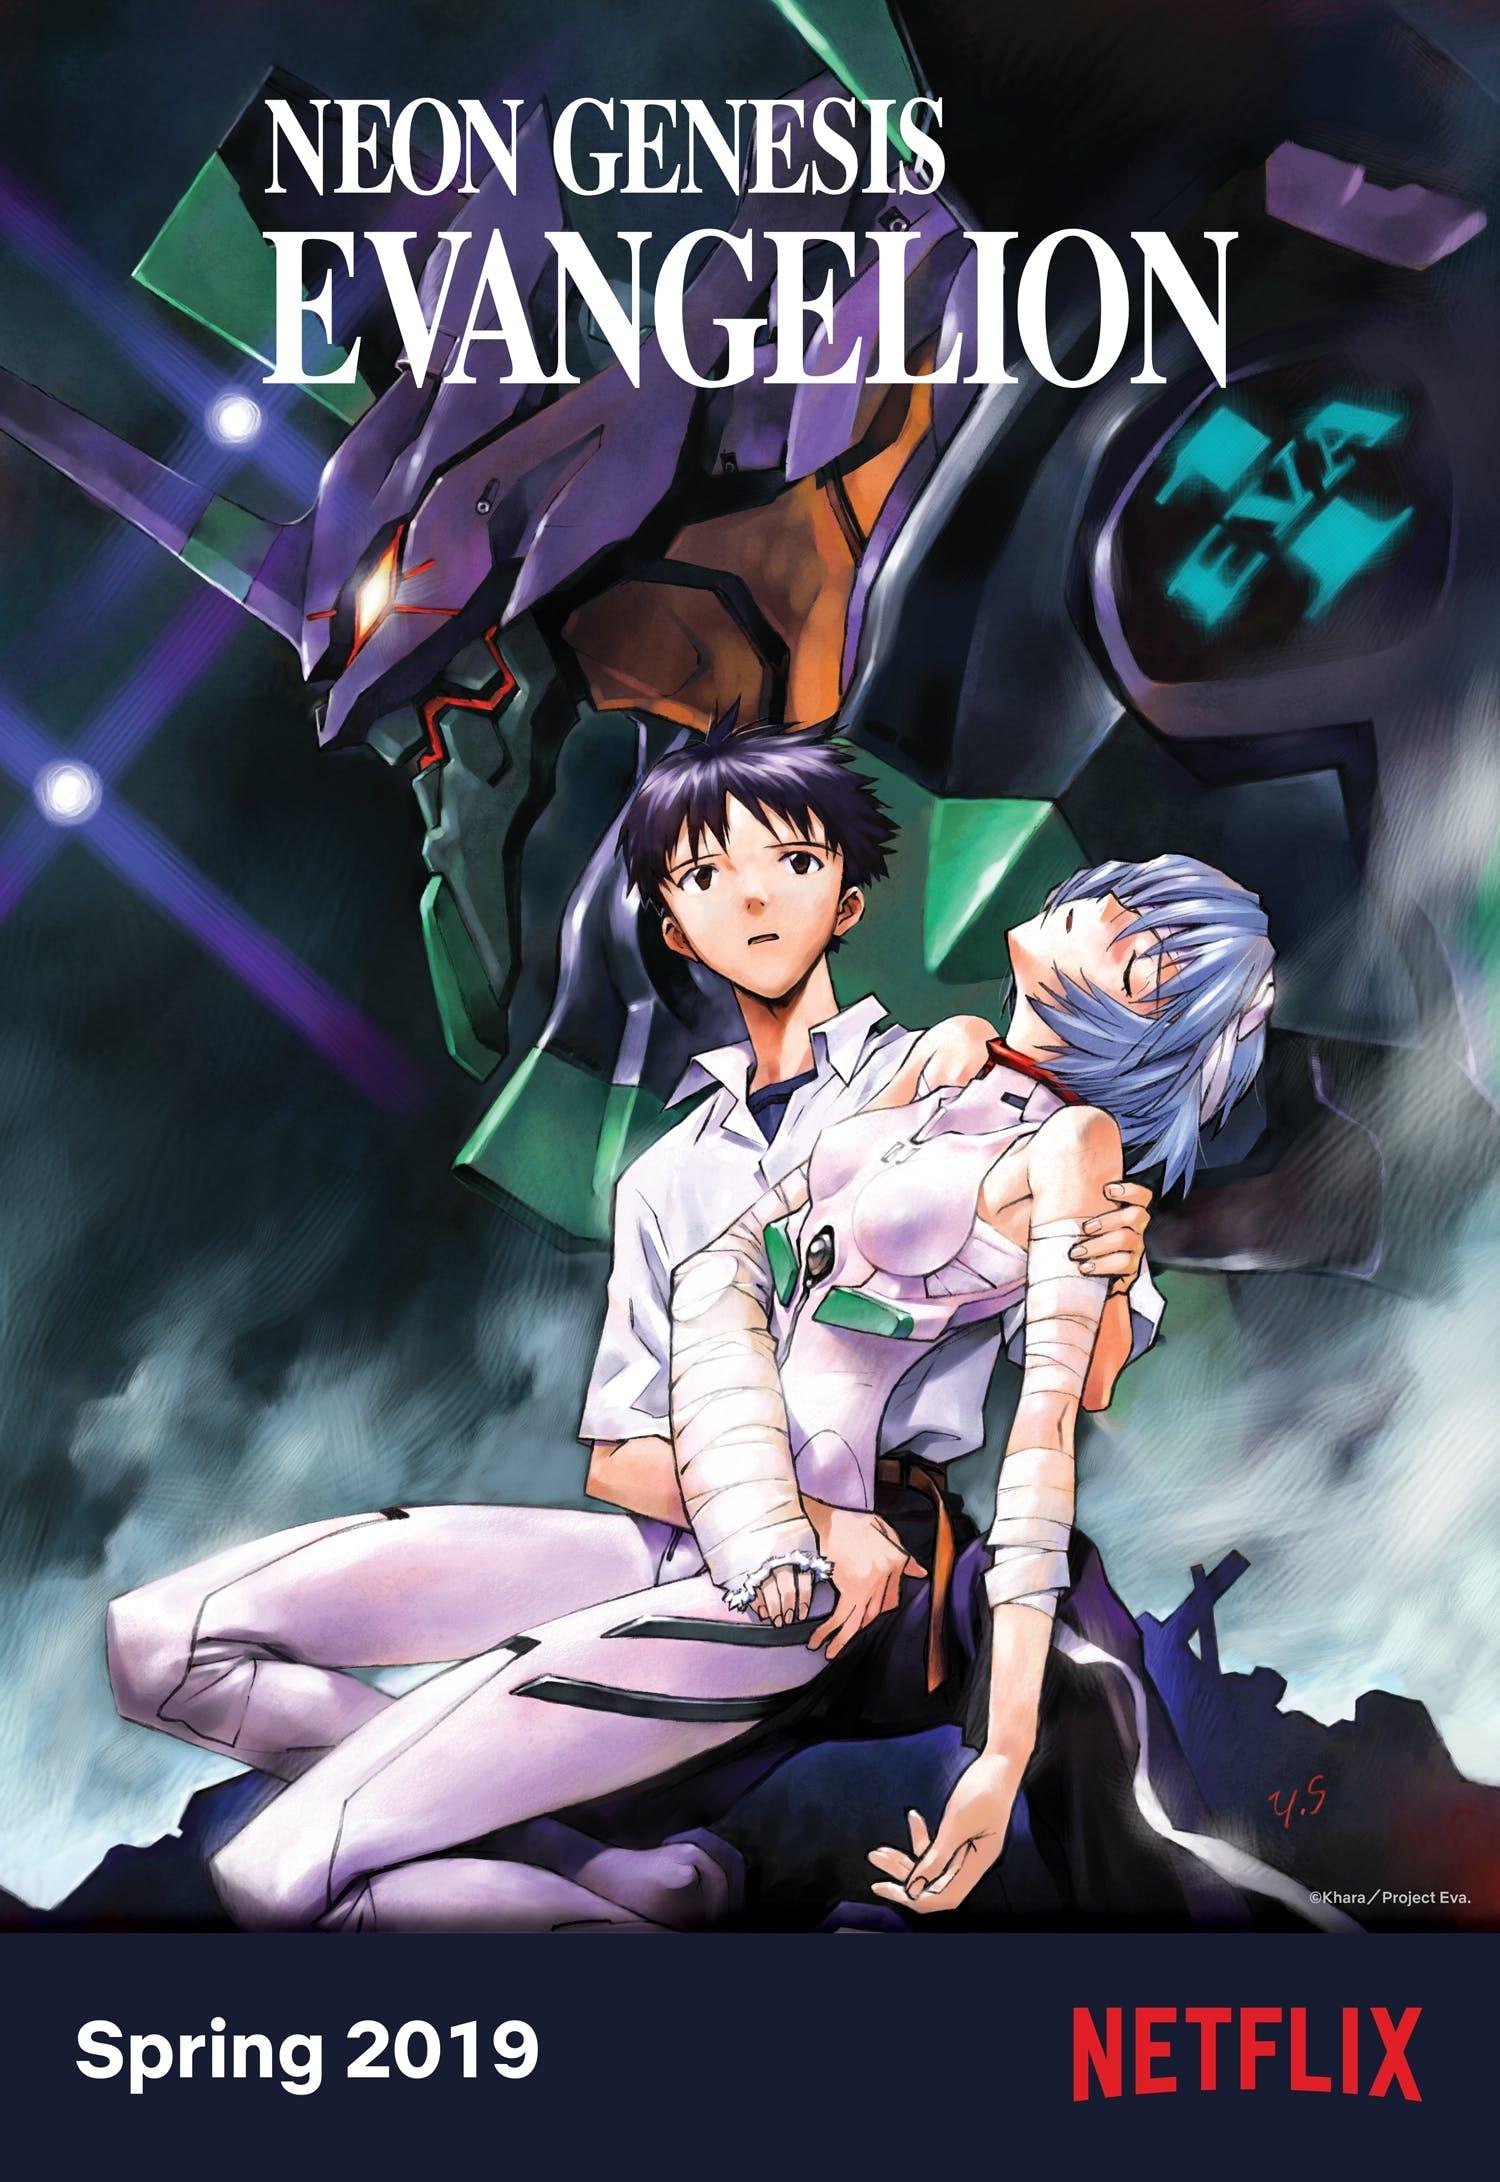 Neon Genesis Evangelion Netflix Gainax Hideaki Anno Spring 2019 Shinji Ikari